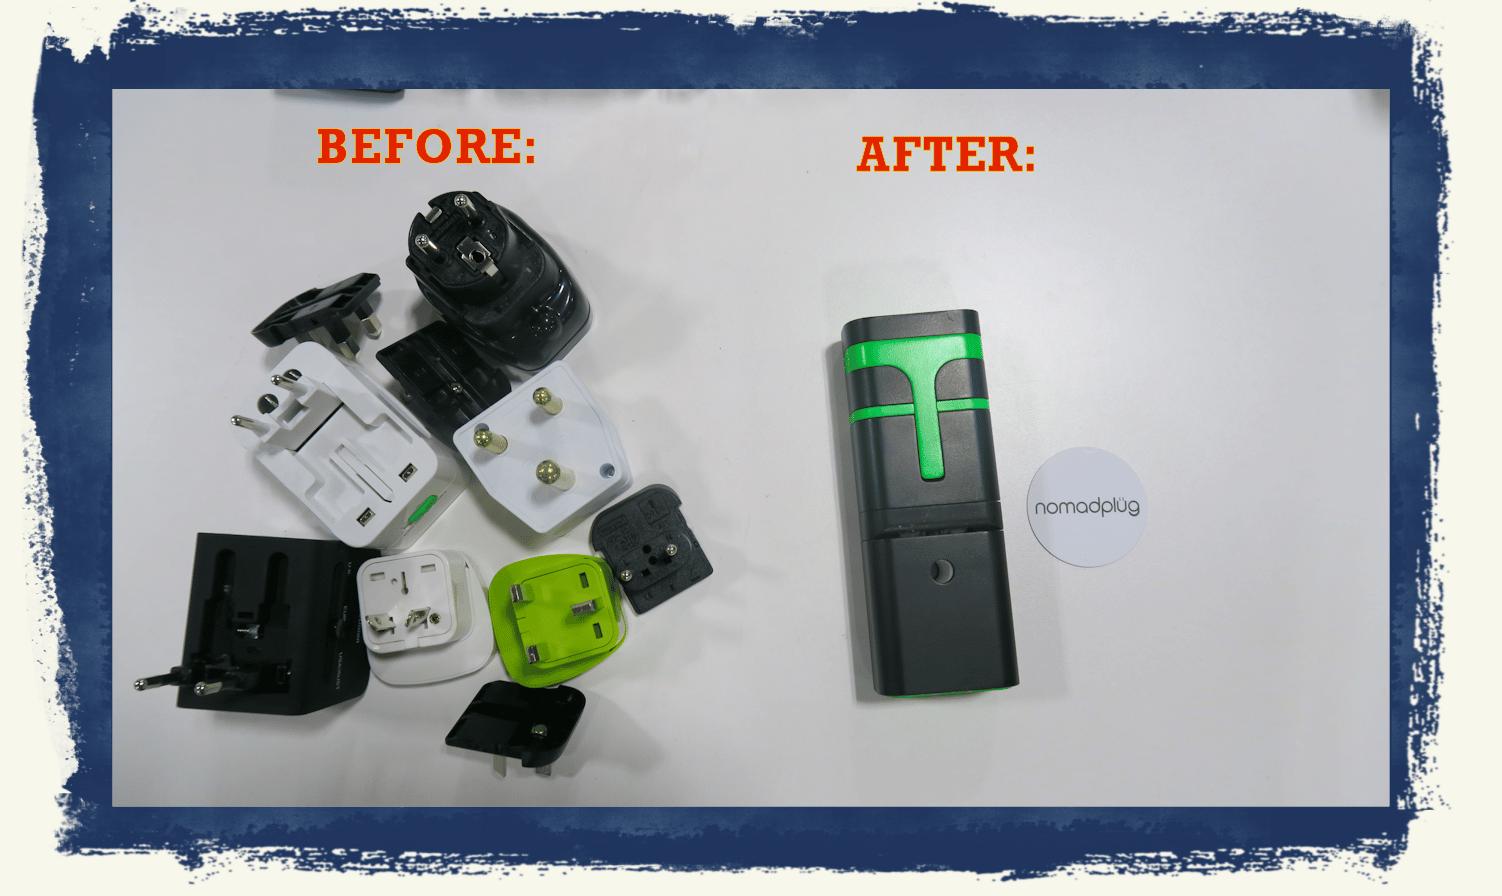 nomadplug travel adaptor before after